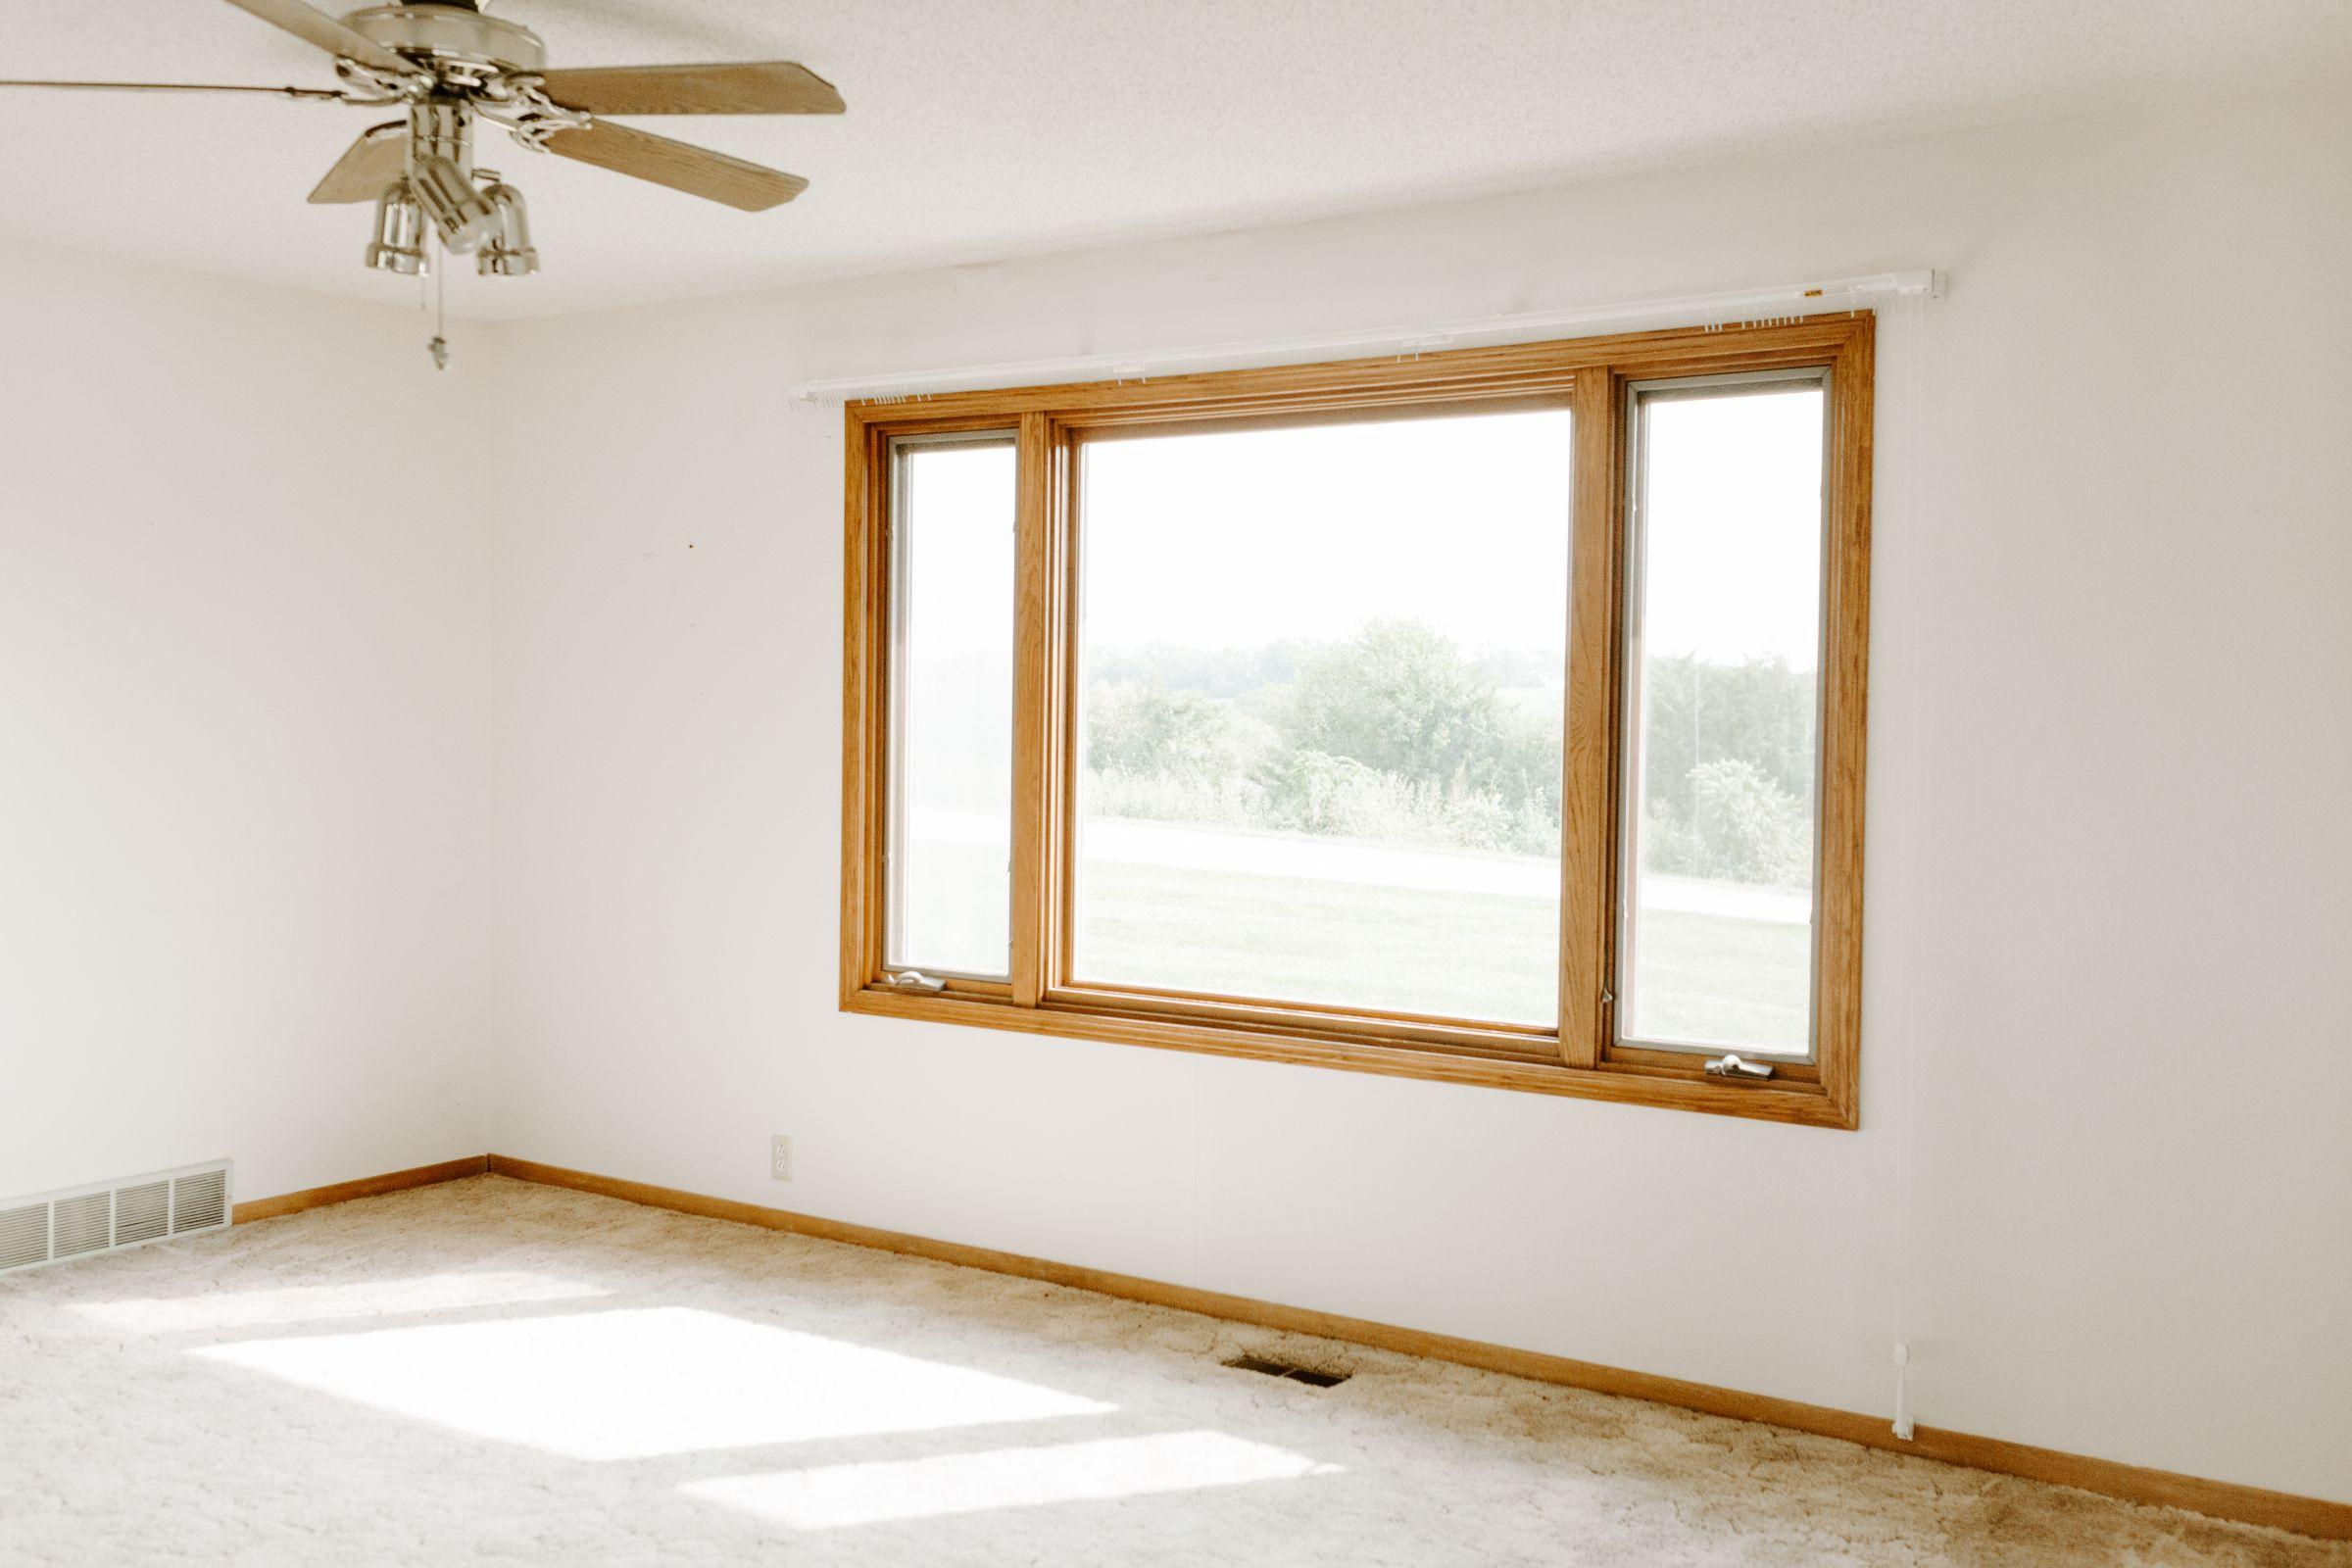 residential-warren-county-iowa-2-acres-listing-number-15743-5-2021-09-15-193738.jpg